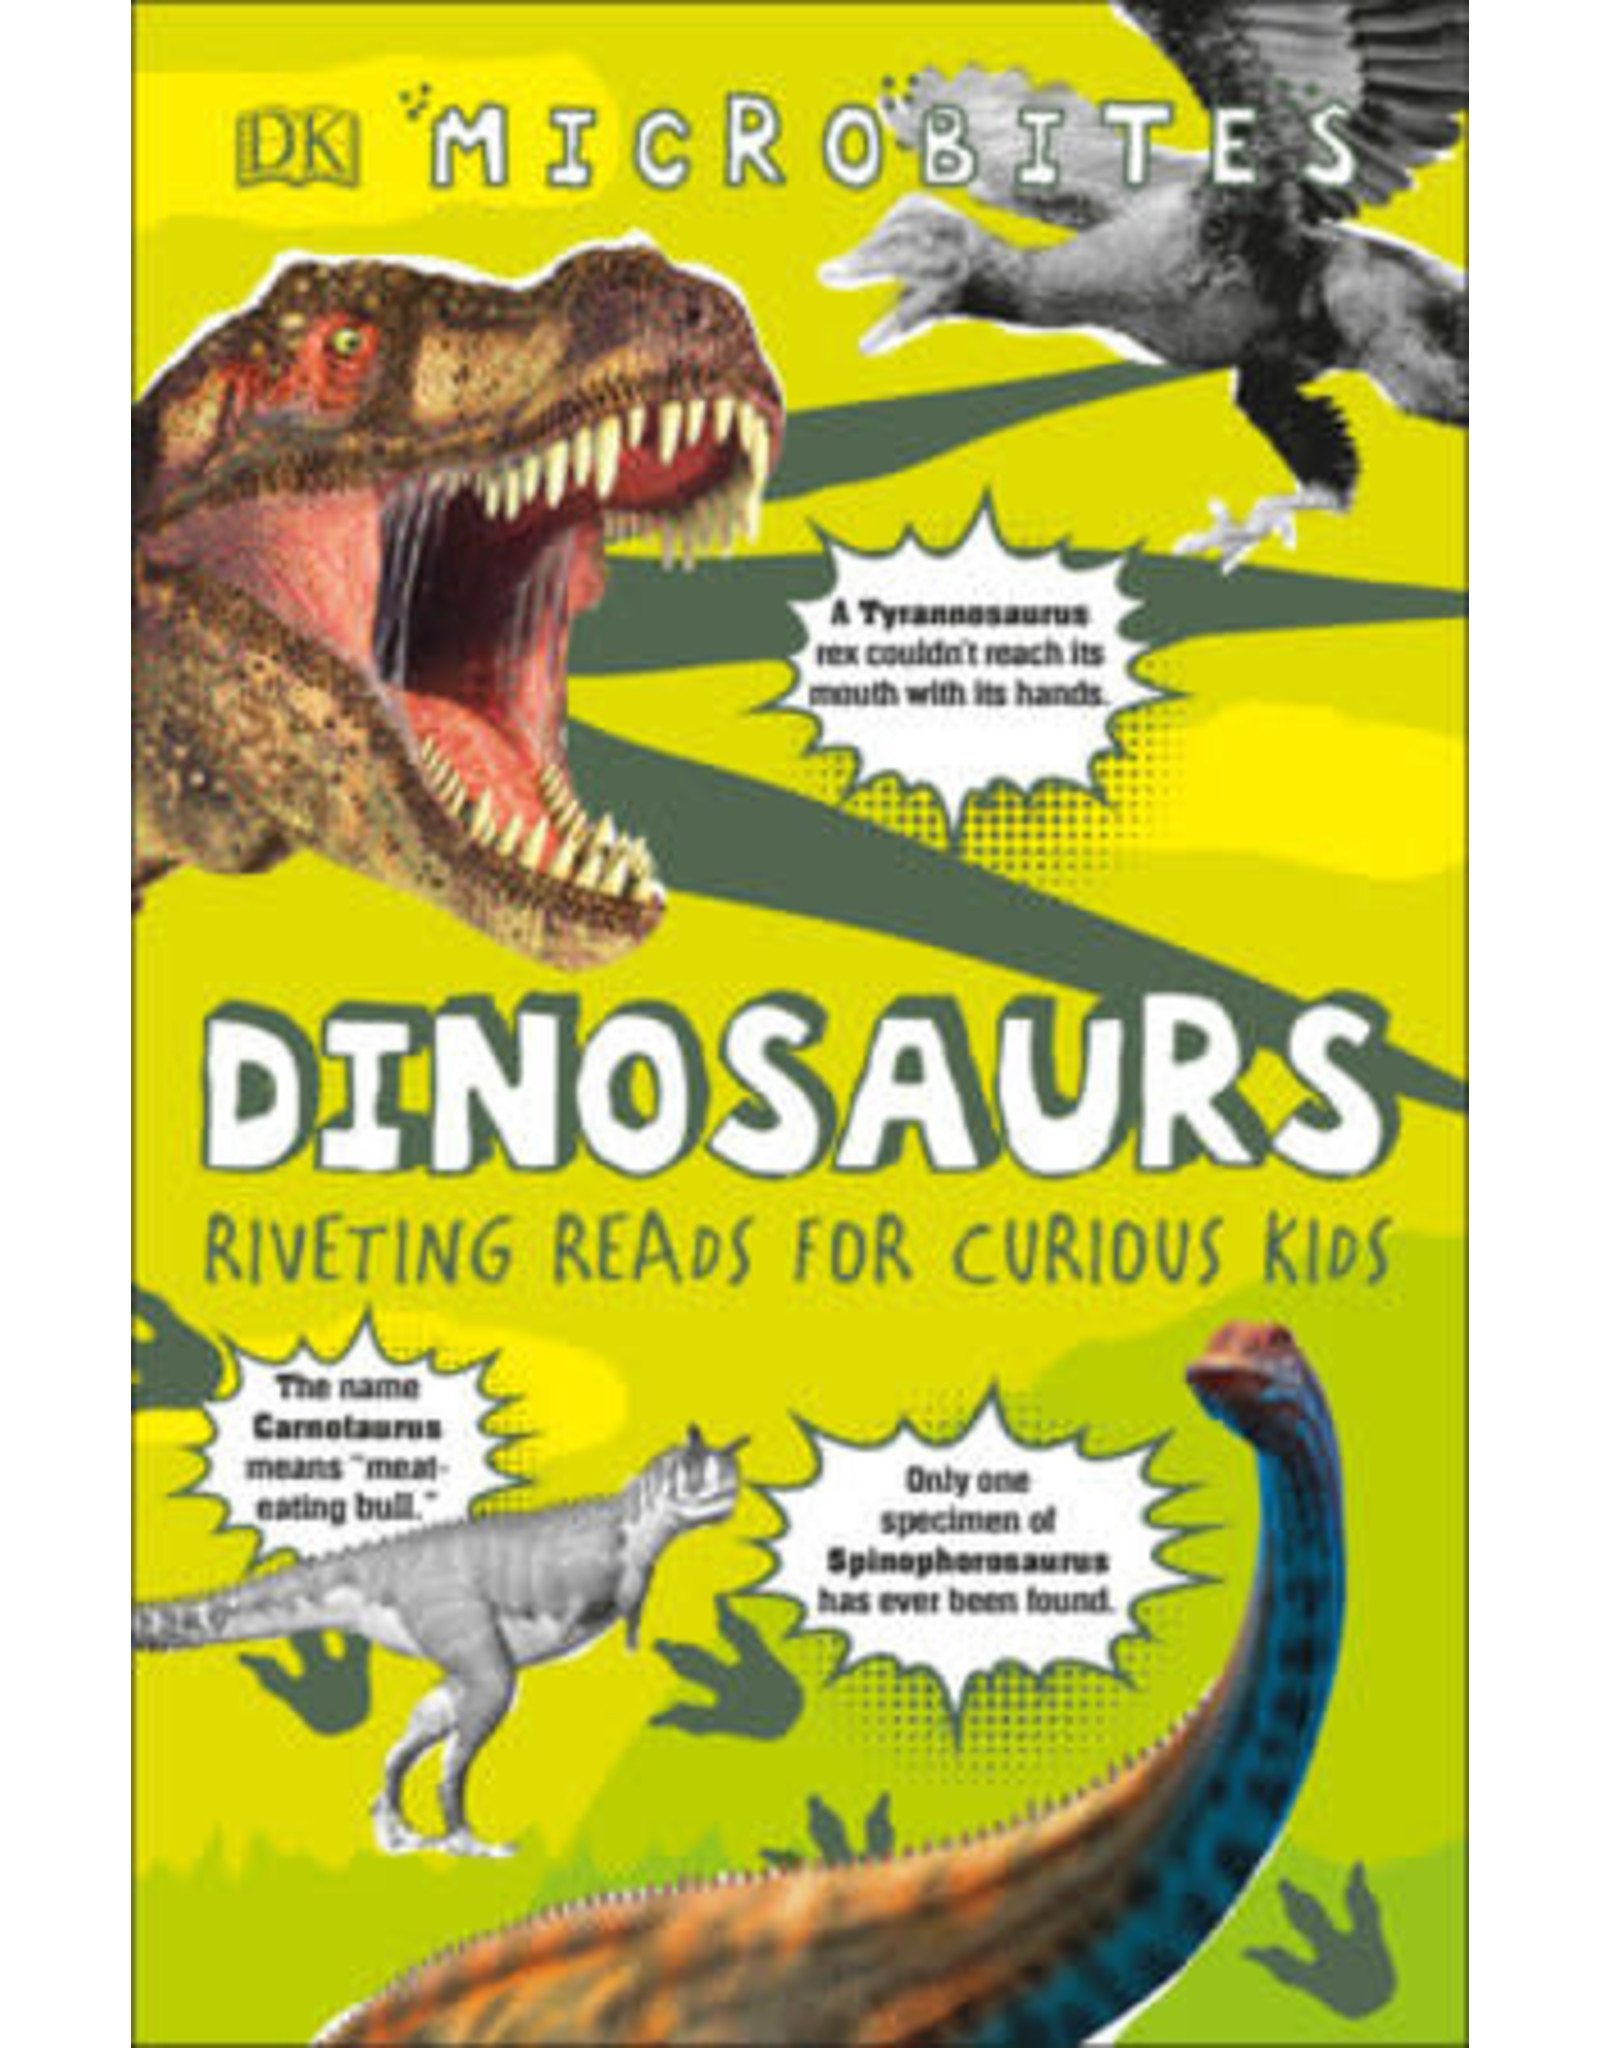 DK Microbites: Dinosaurs